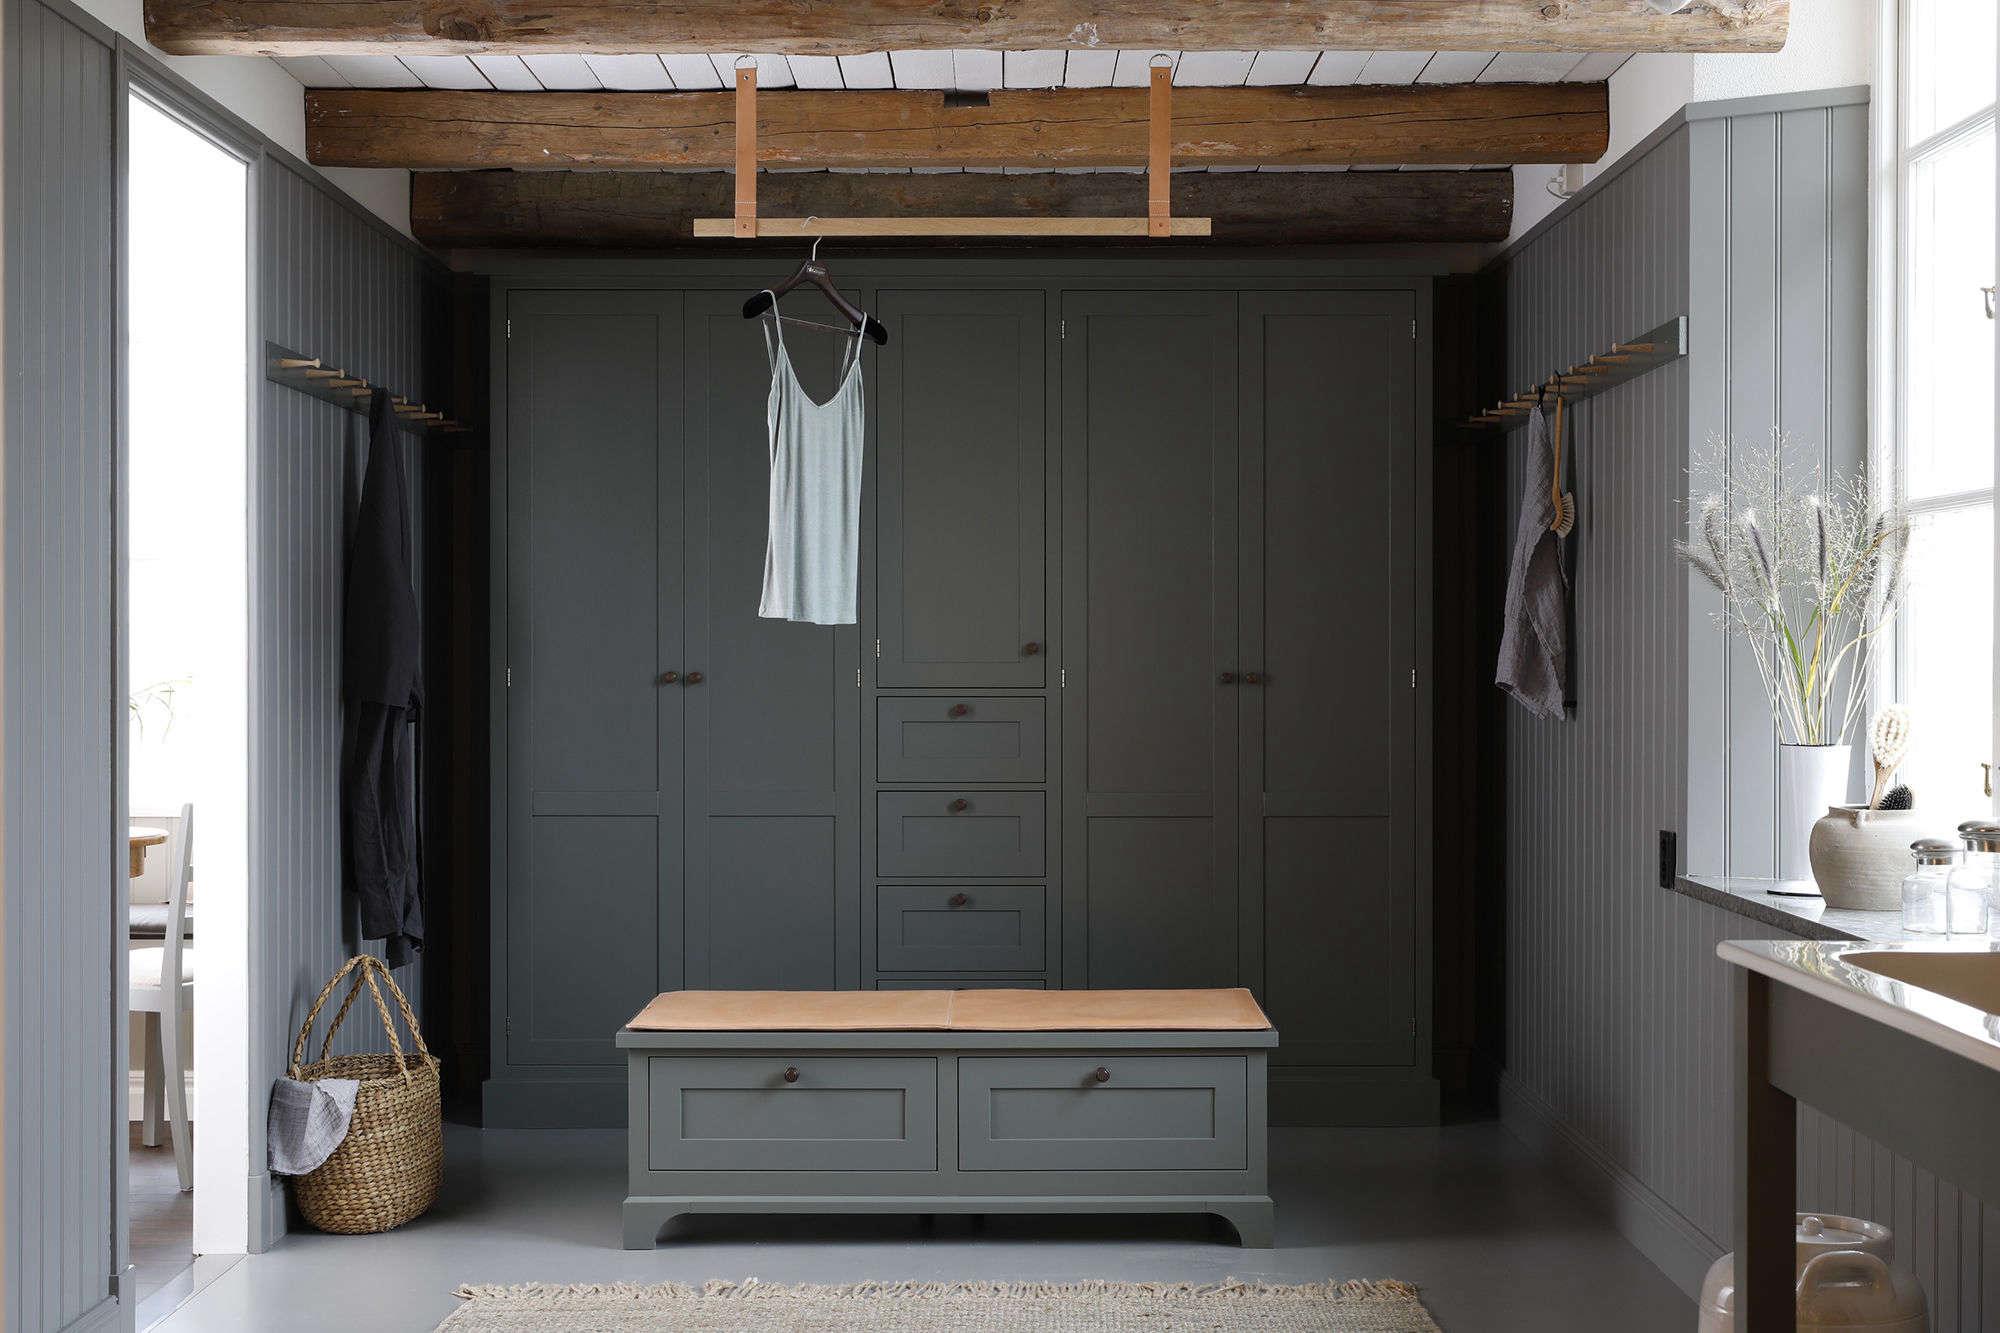 Home Storage & Organization cover image